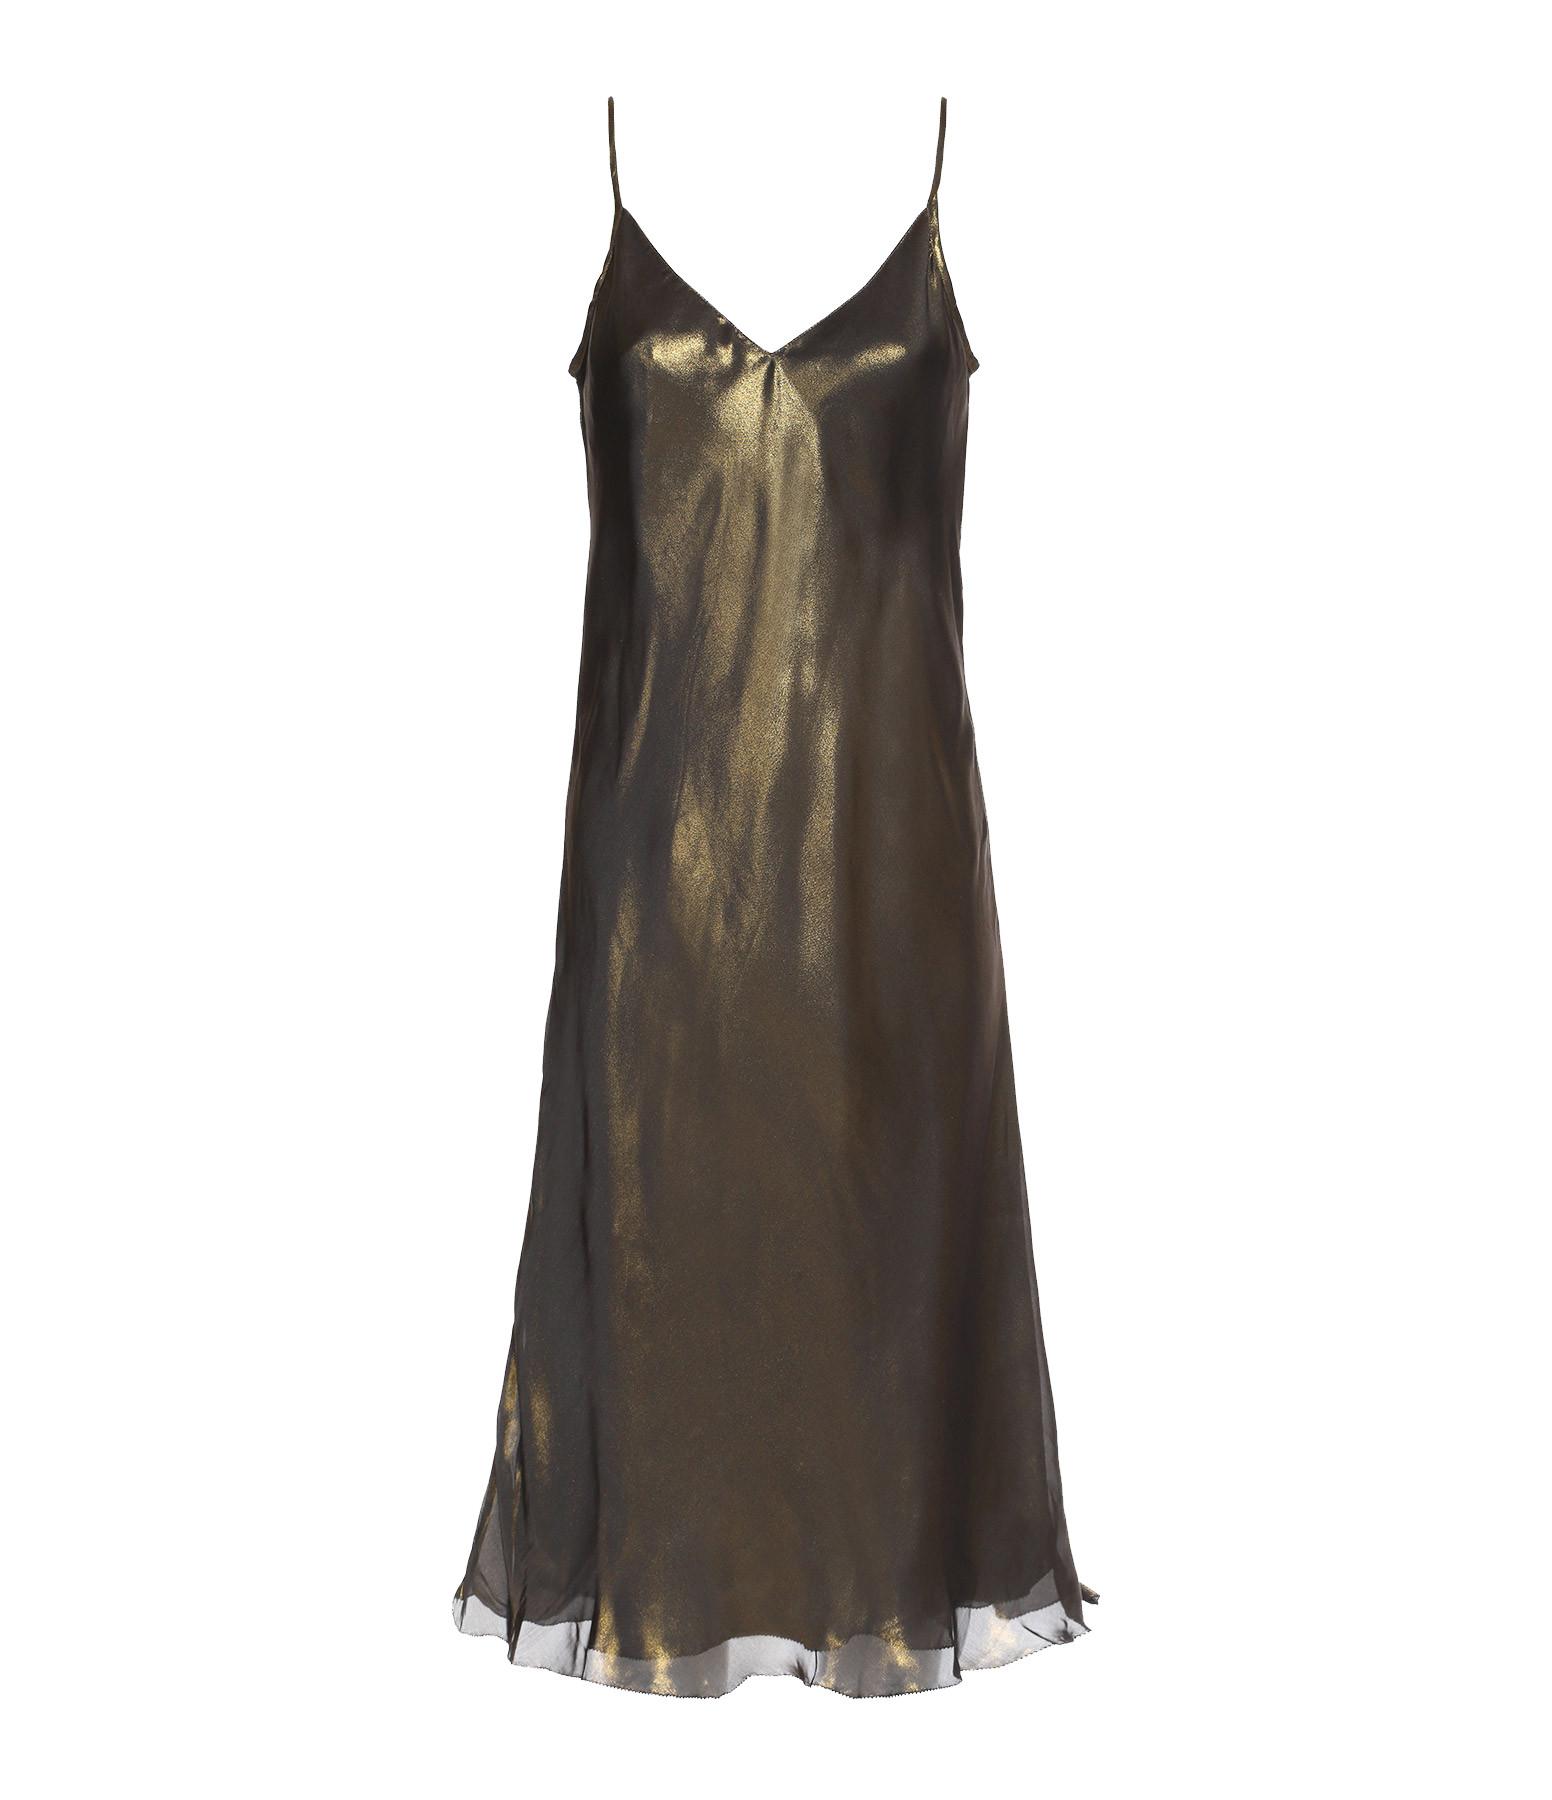 MES DEMOISELLES - Robe Gotha Bronze